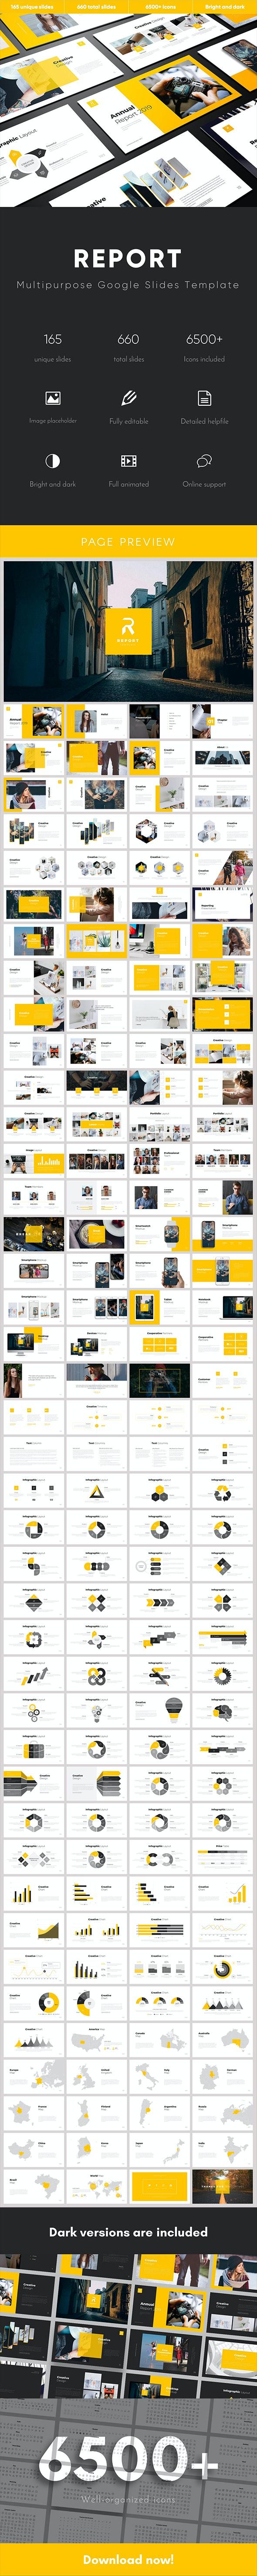 Report Multipurpose Google Slides Template - Google Slides Presentation Templates